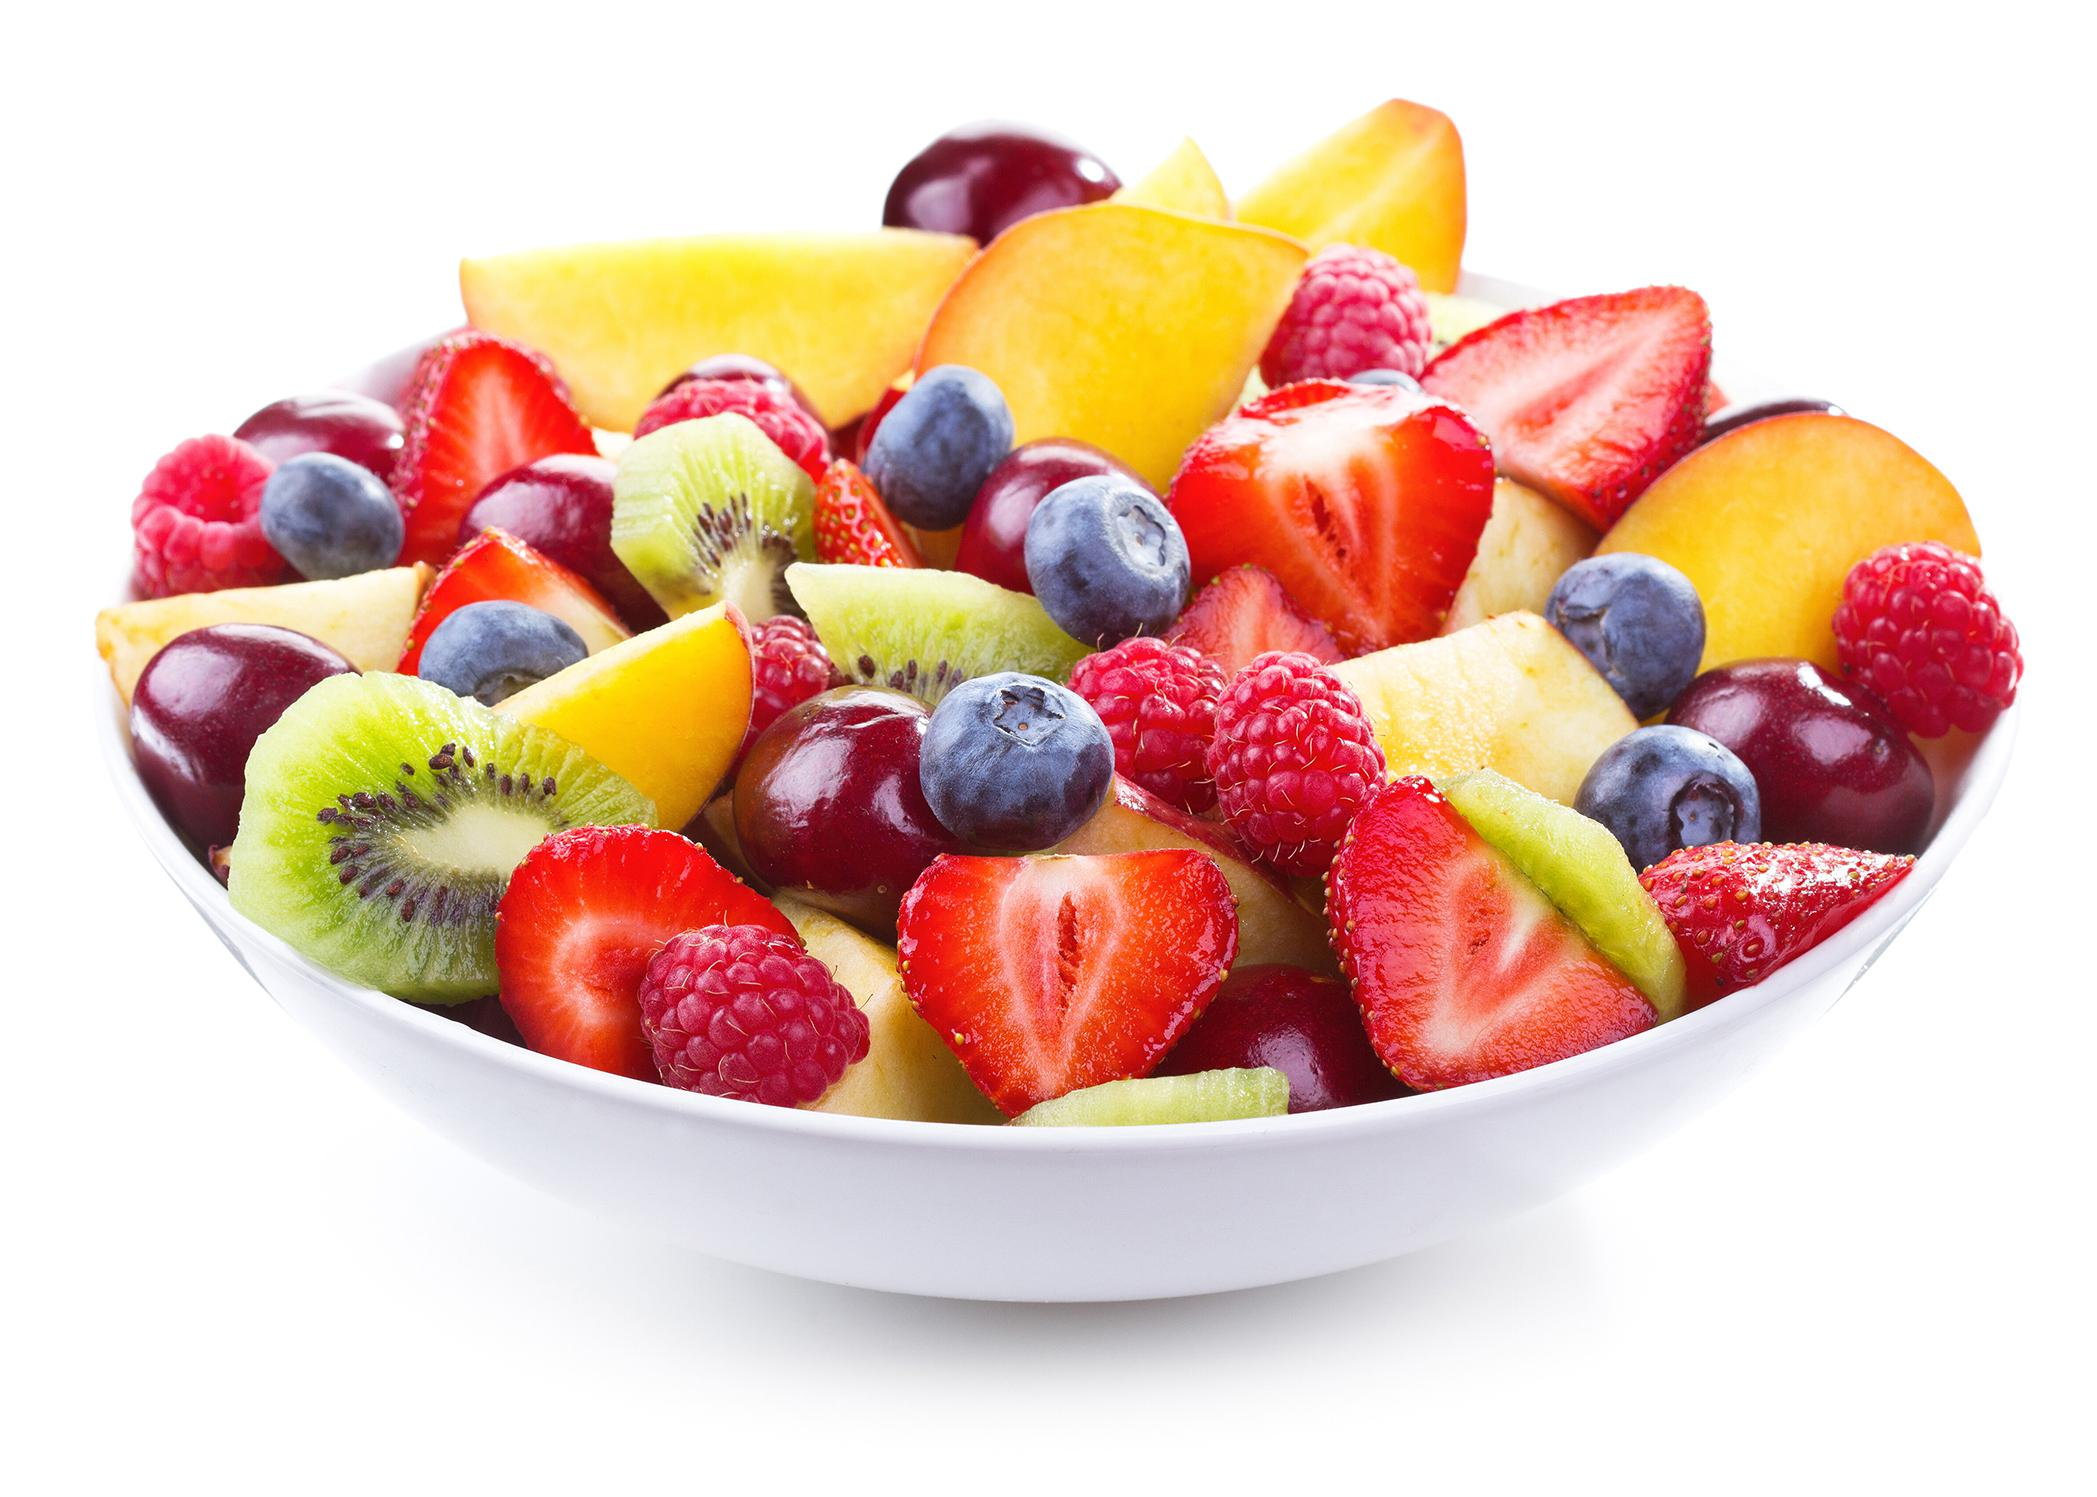 A bowl of various fruits